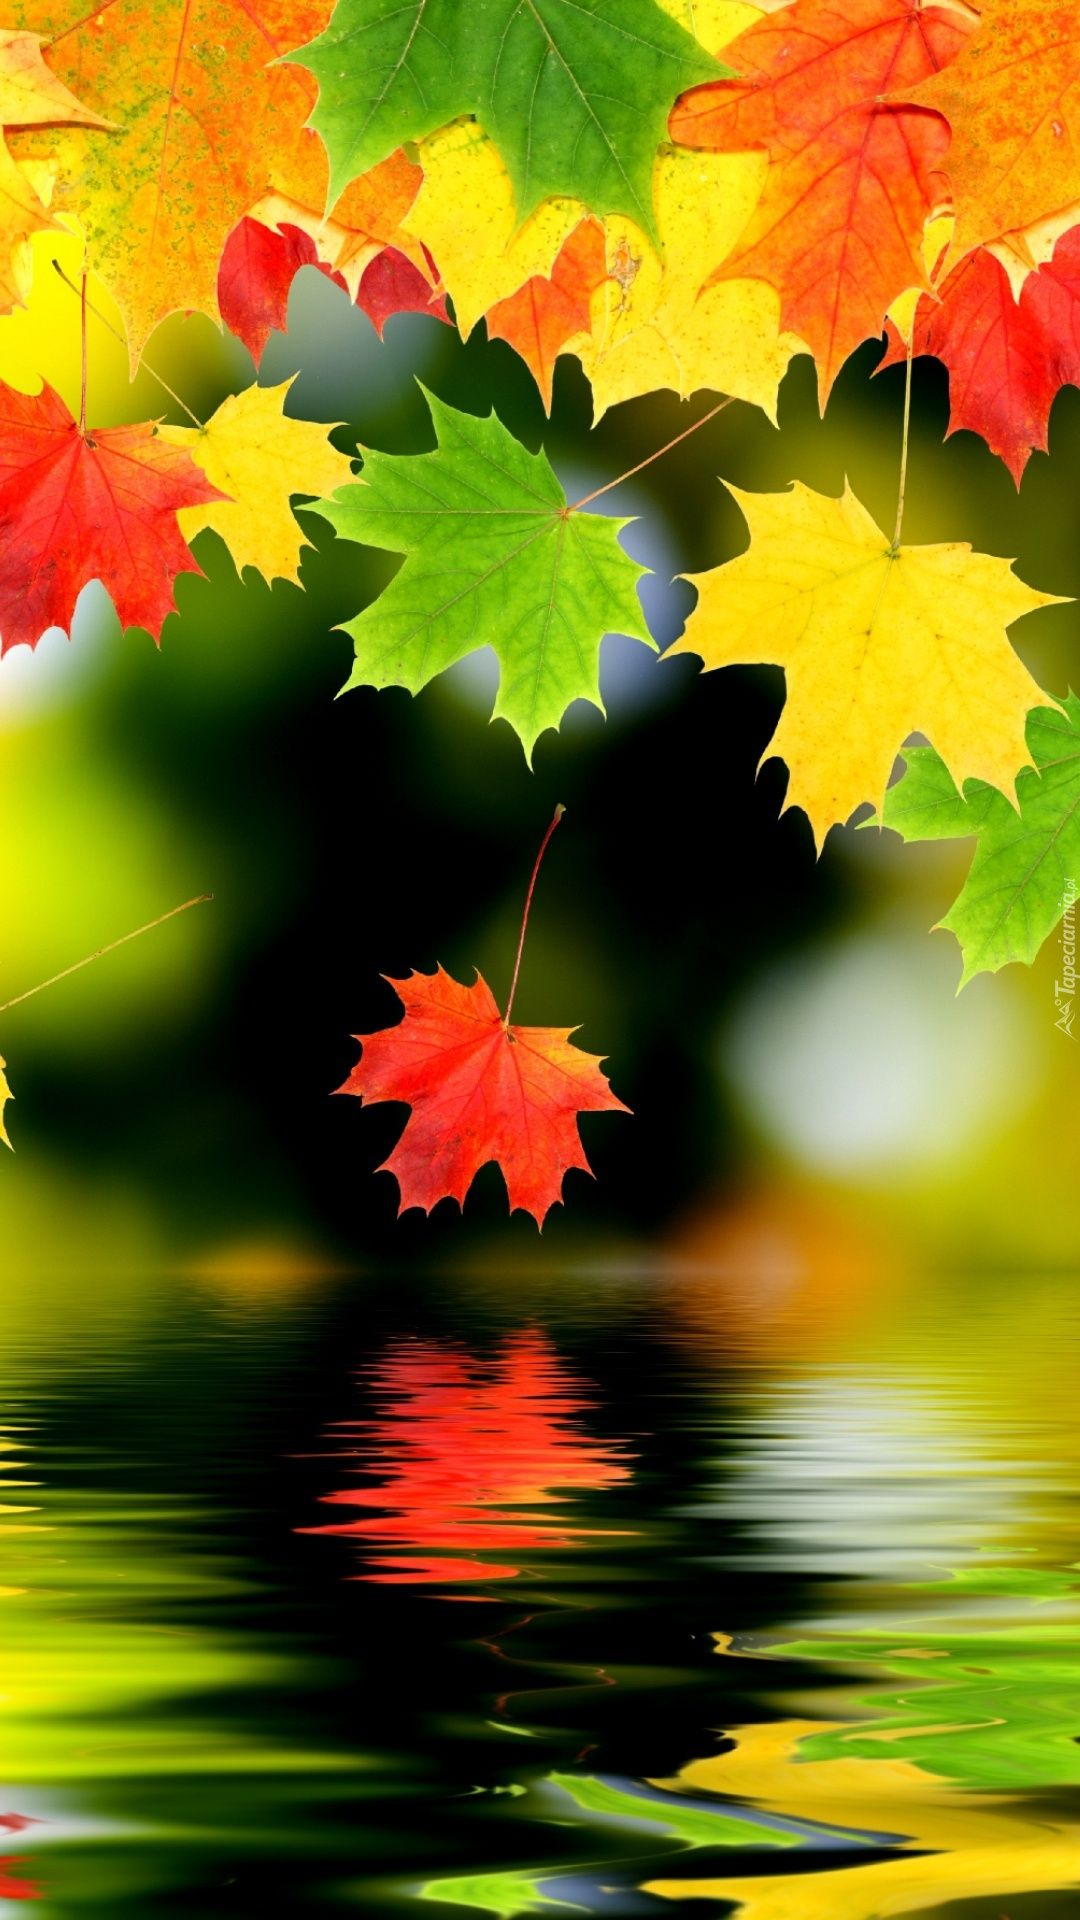 Kolorowe Liscie Spadaja Do Wody Thanksgiving Live Wallpaper Fall Wallpaper Nature Wallpaper